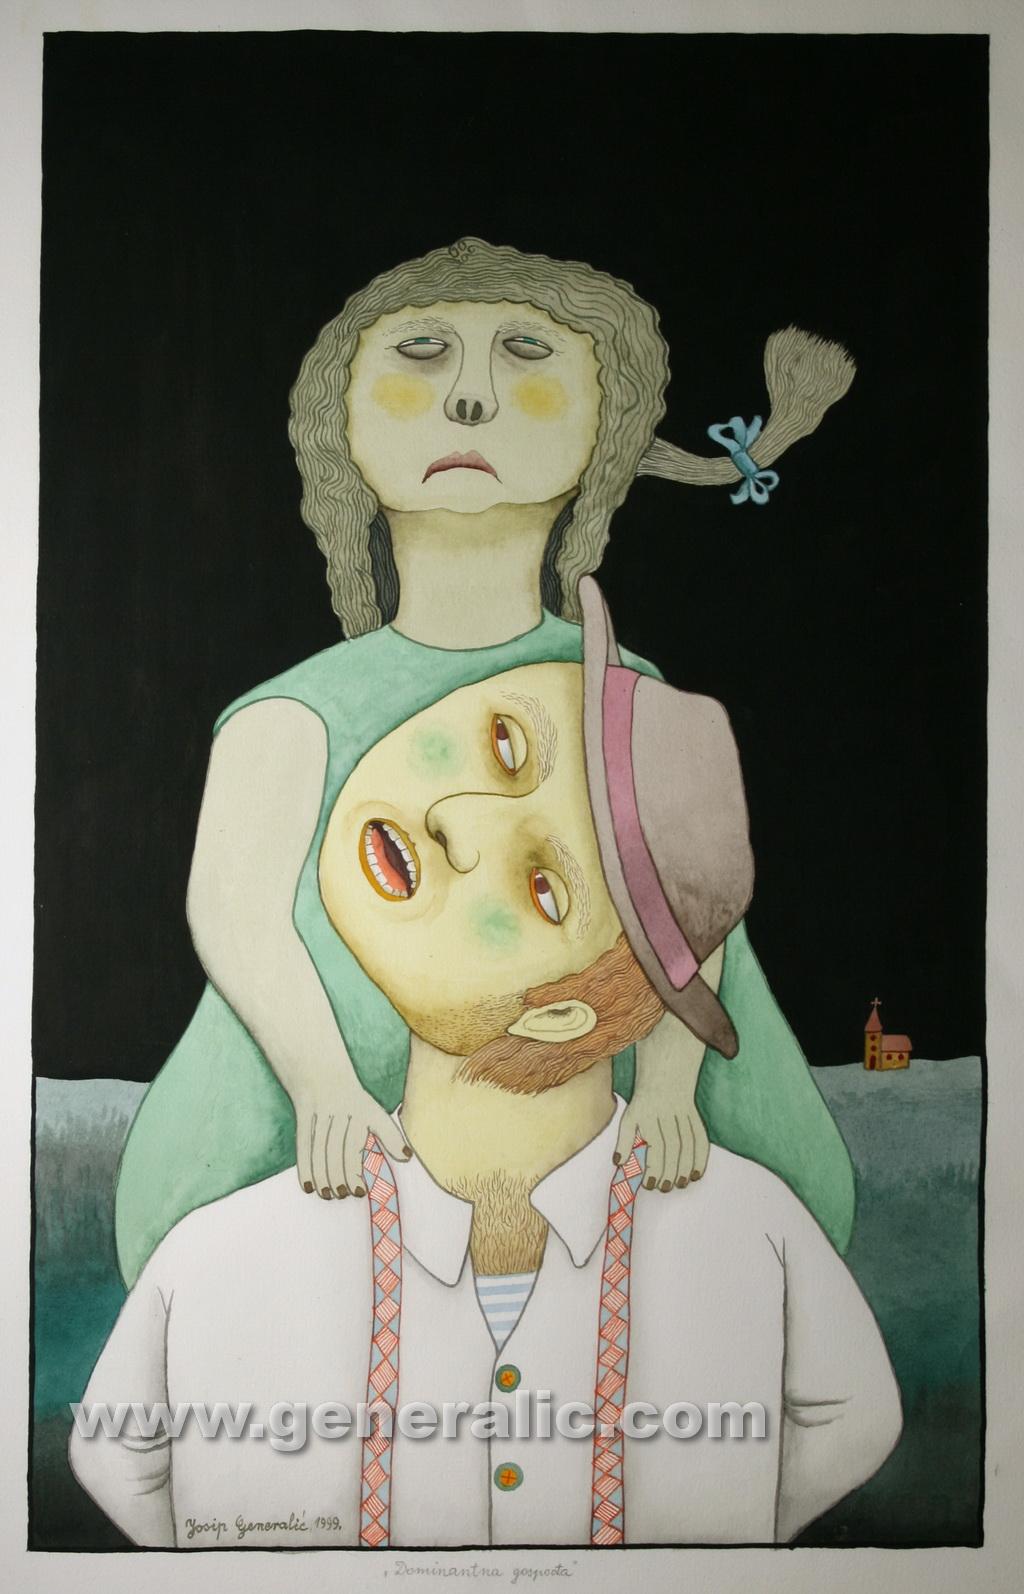 Josip Generalic, 1999, Dominant housewife, watercolour, 69x43 cm